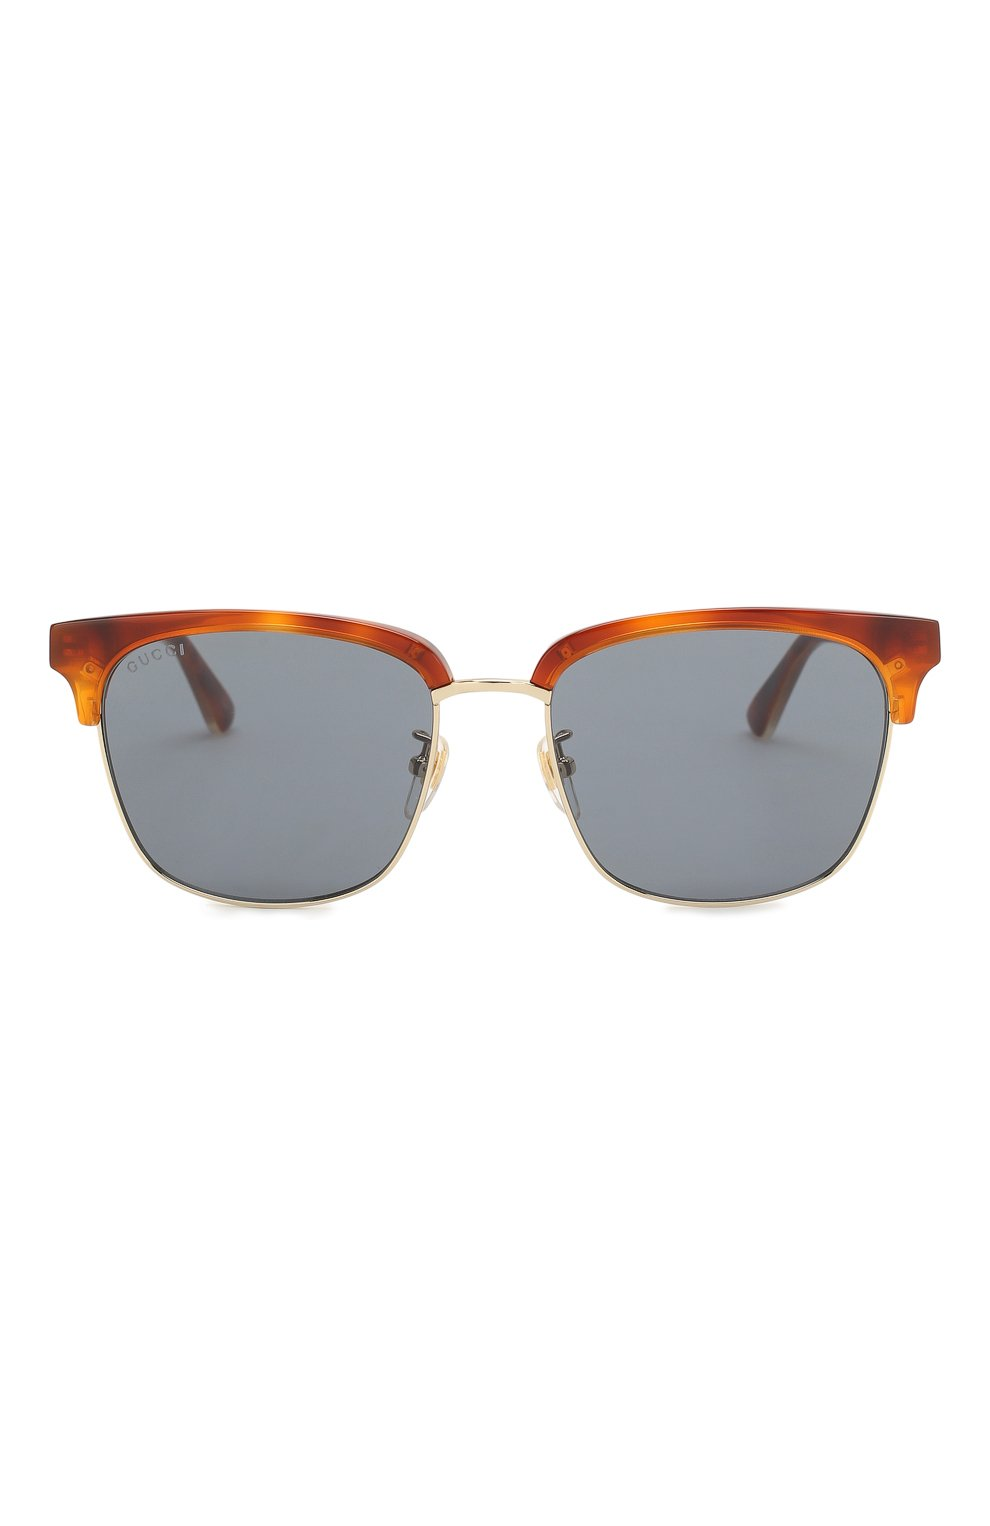 Солнцезащитные очки Gucci синие   Фото №3